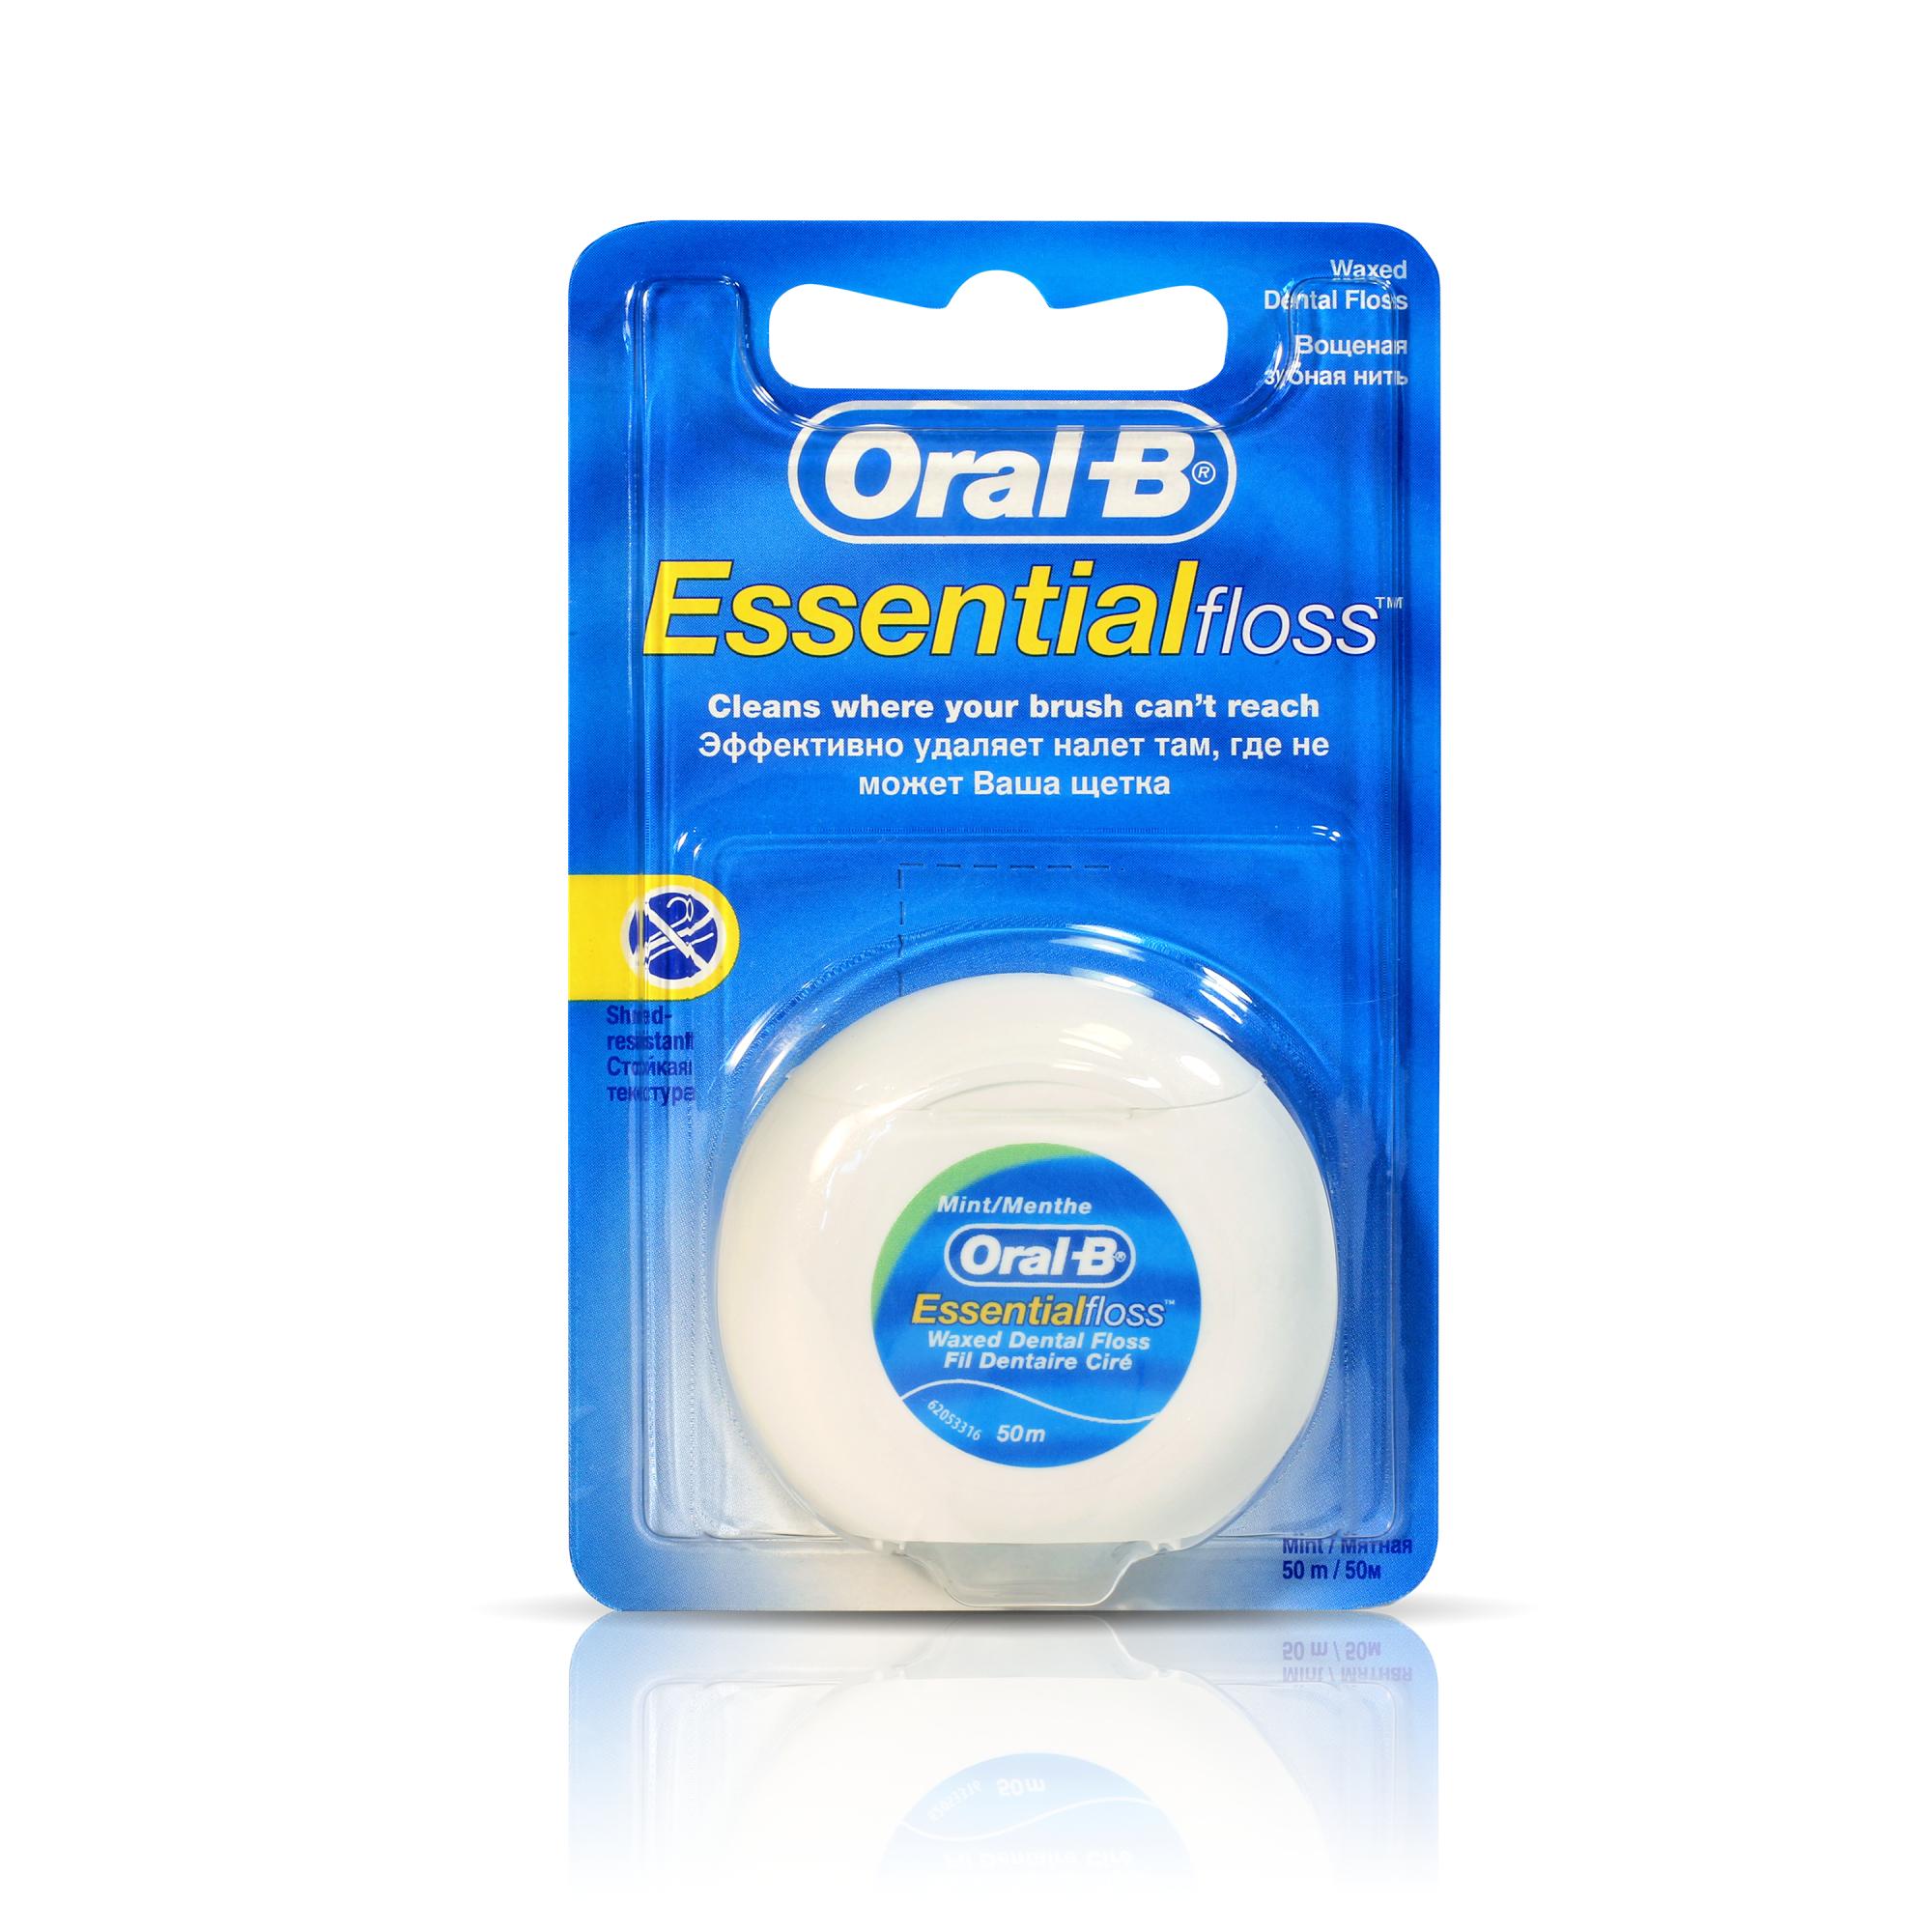 Фото - Зубная нить Oral-B Essential Мятная 50 м зубная нить oral b essential мятная 50m 3014260280772